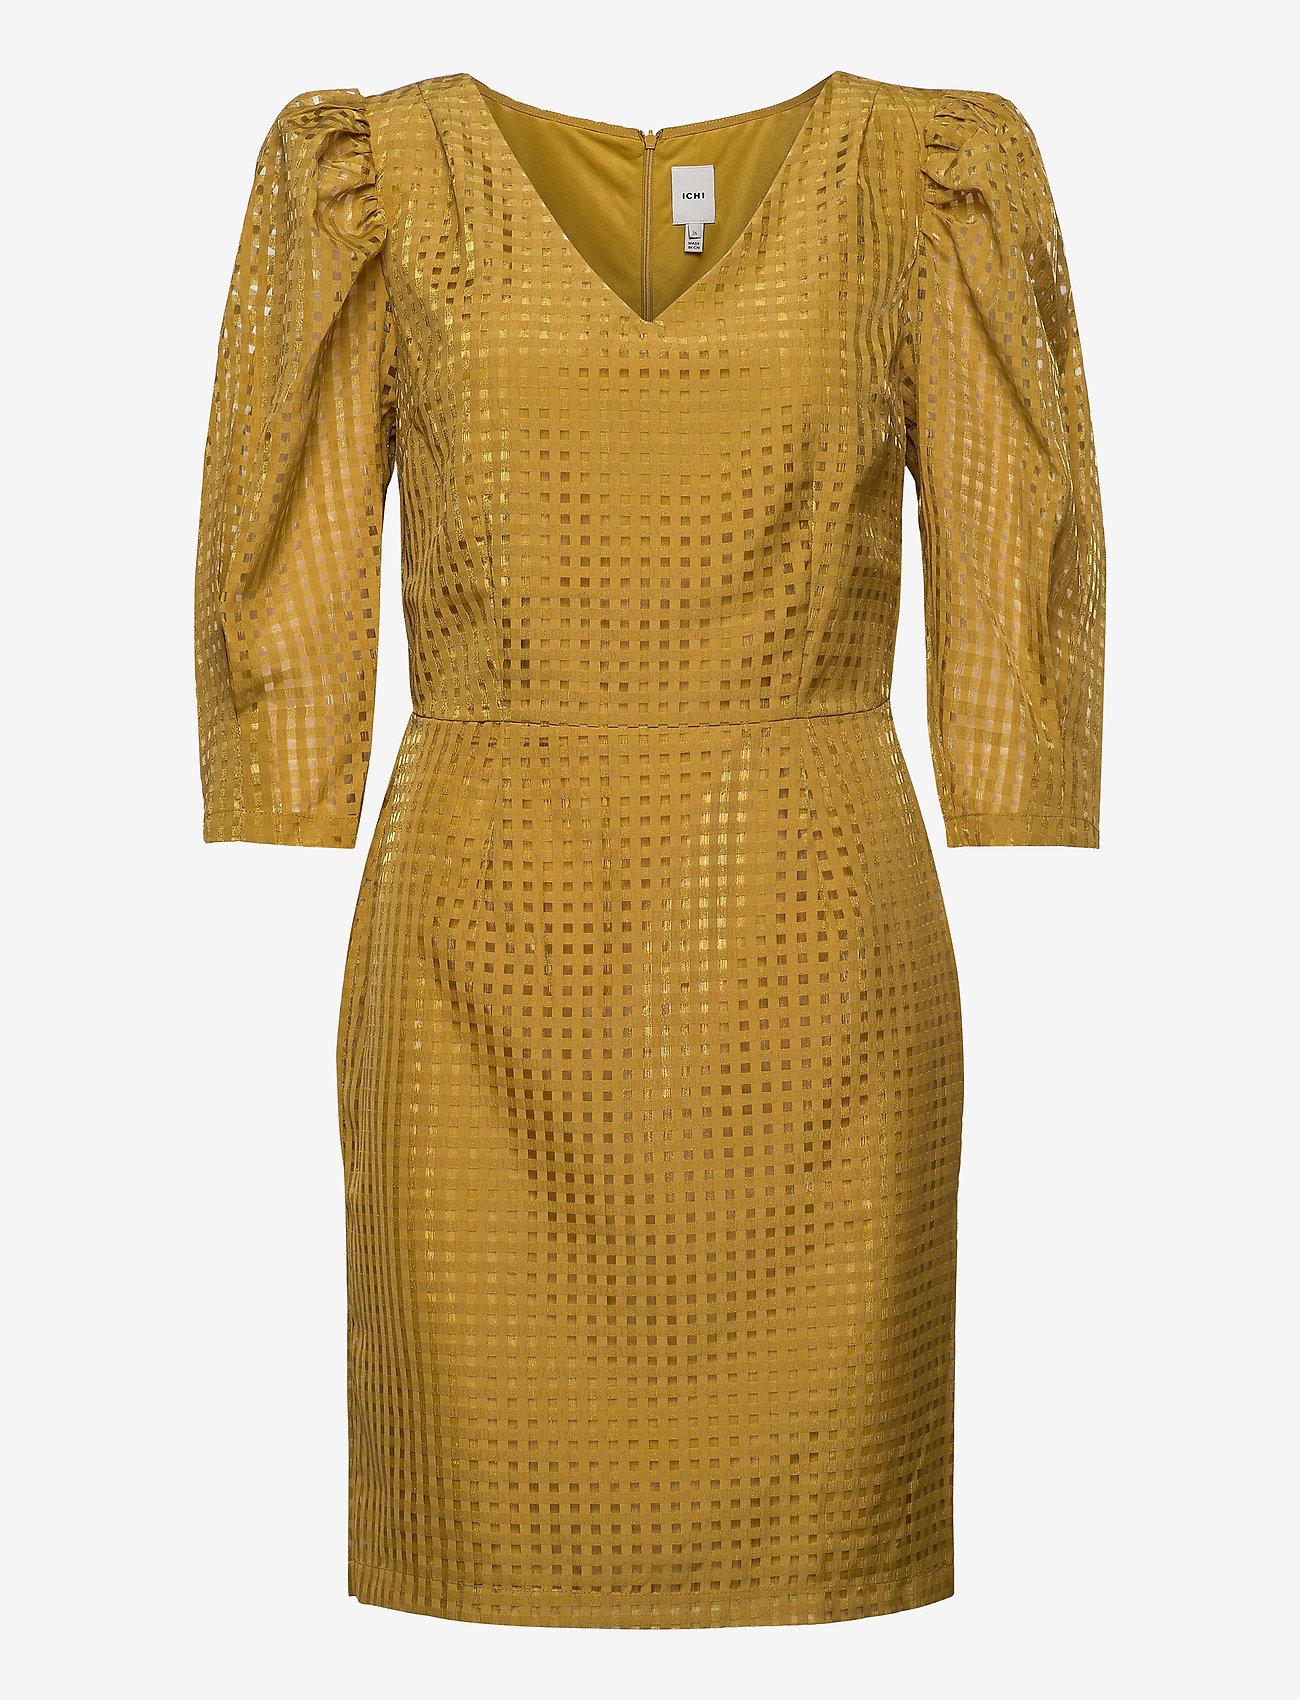 ICHI - IHKAY DR - short dresses - bronze mist - 0